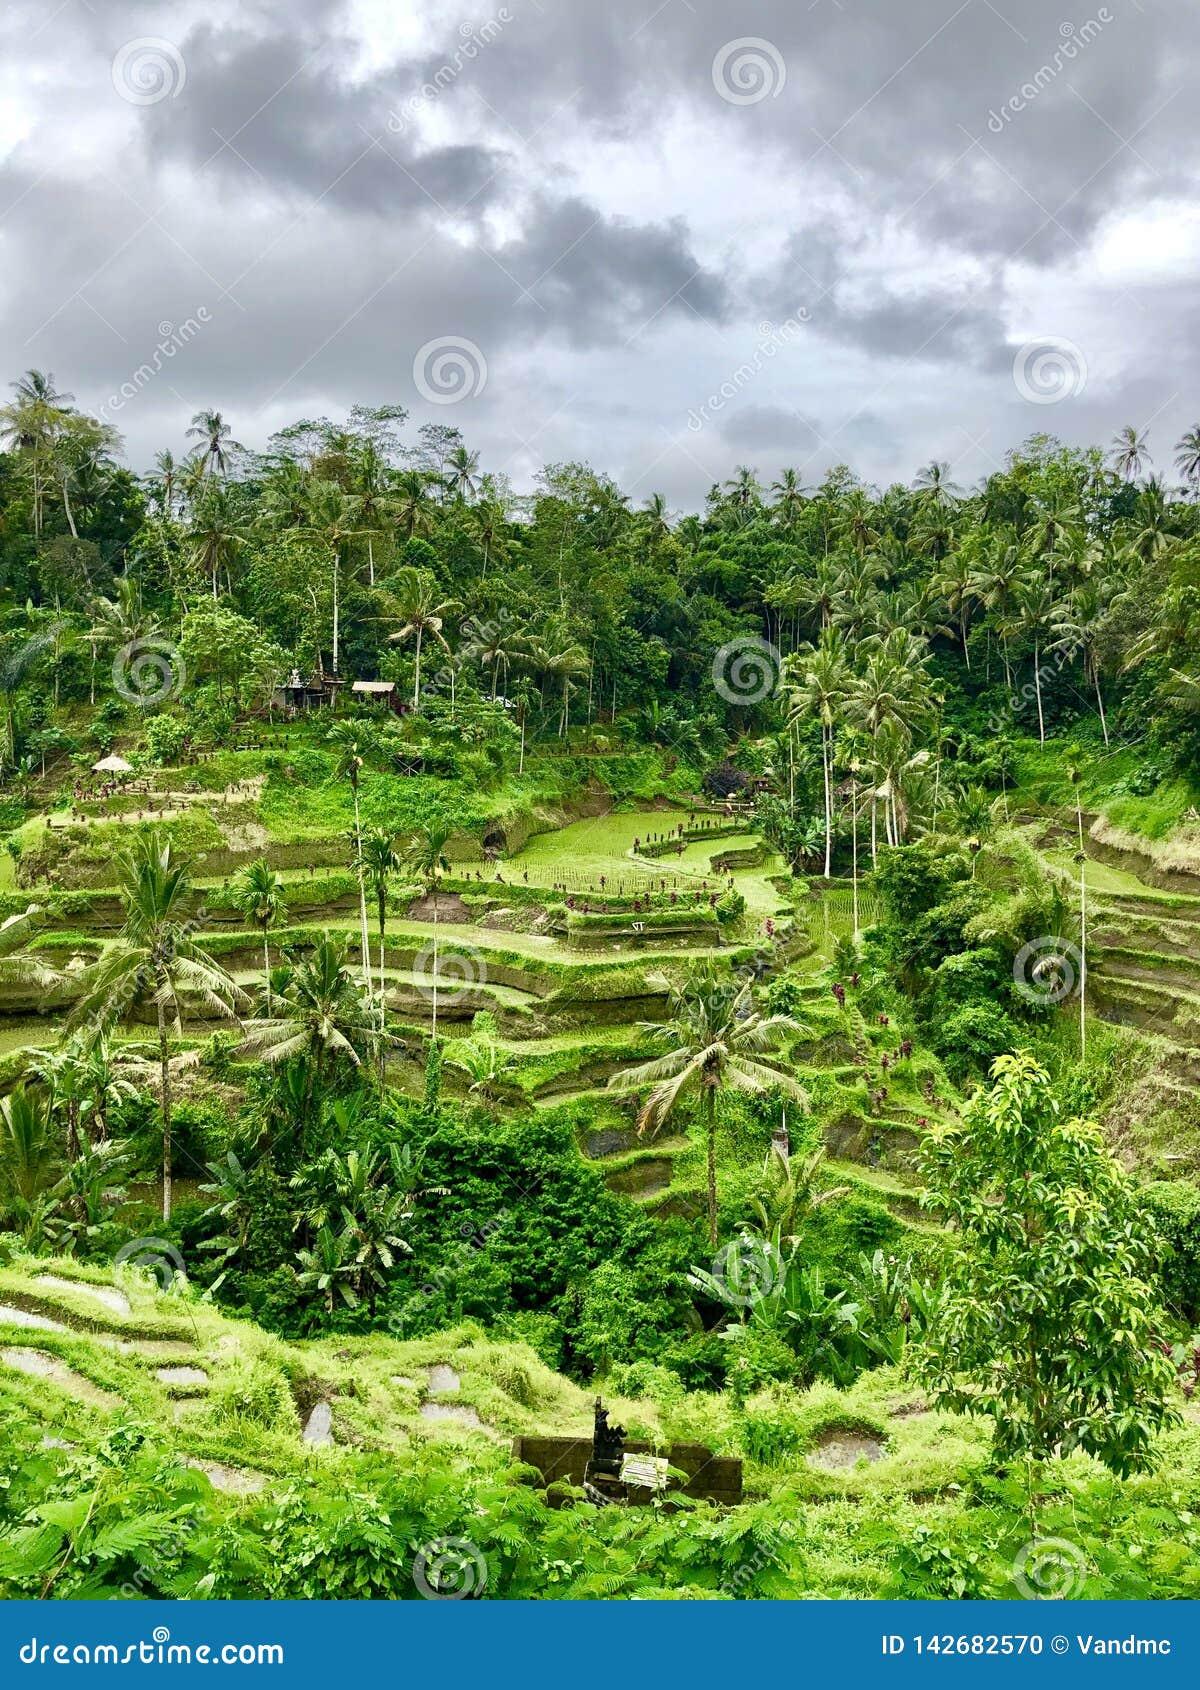 Unusually beautiful rice terraces photo